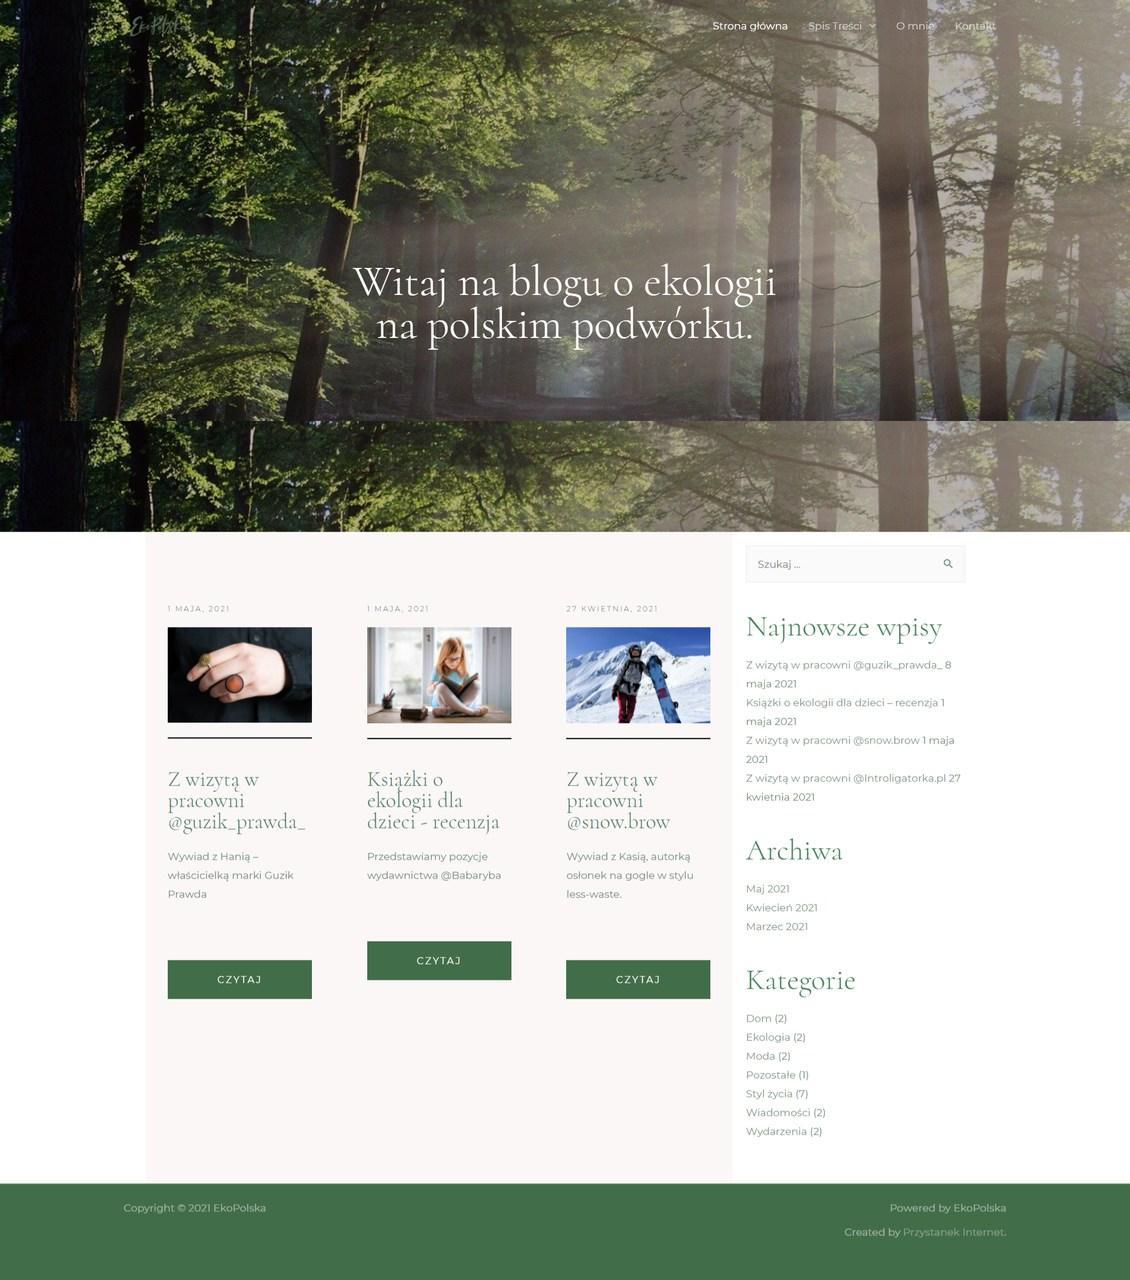 eko-polska-blog